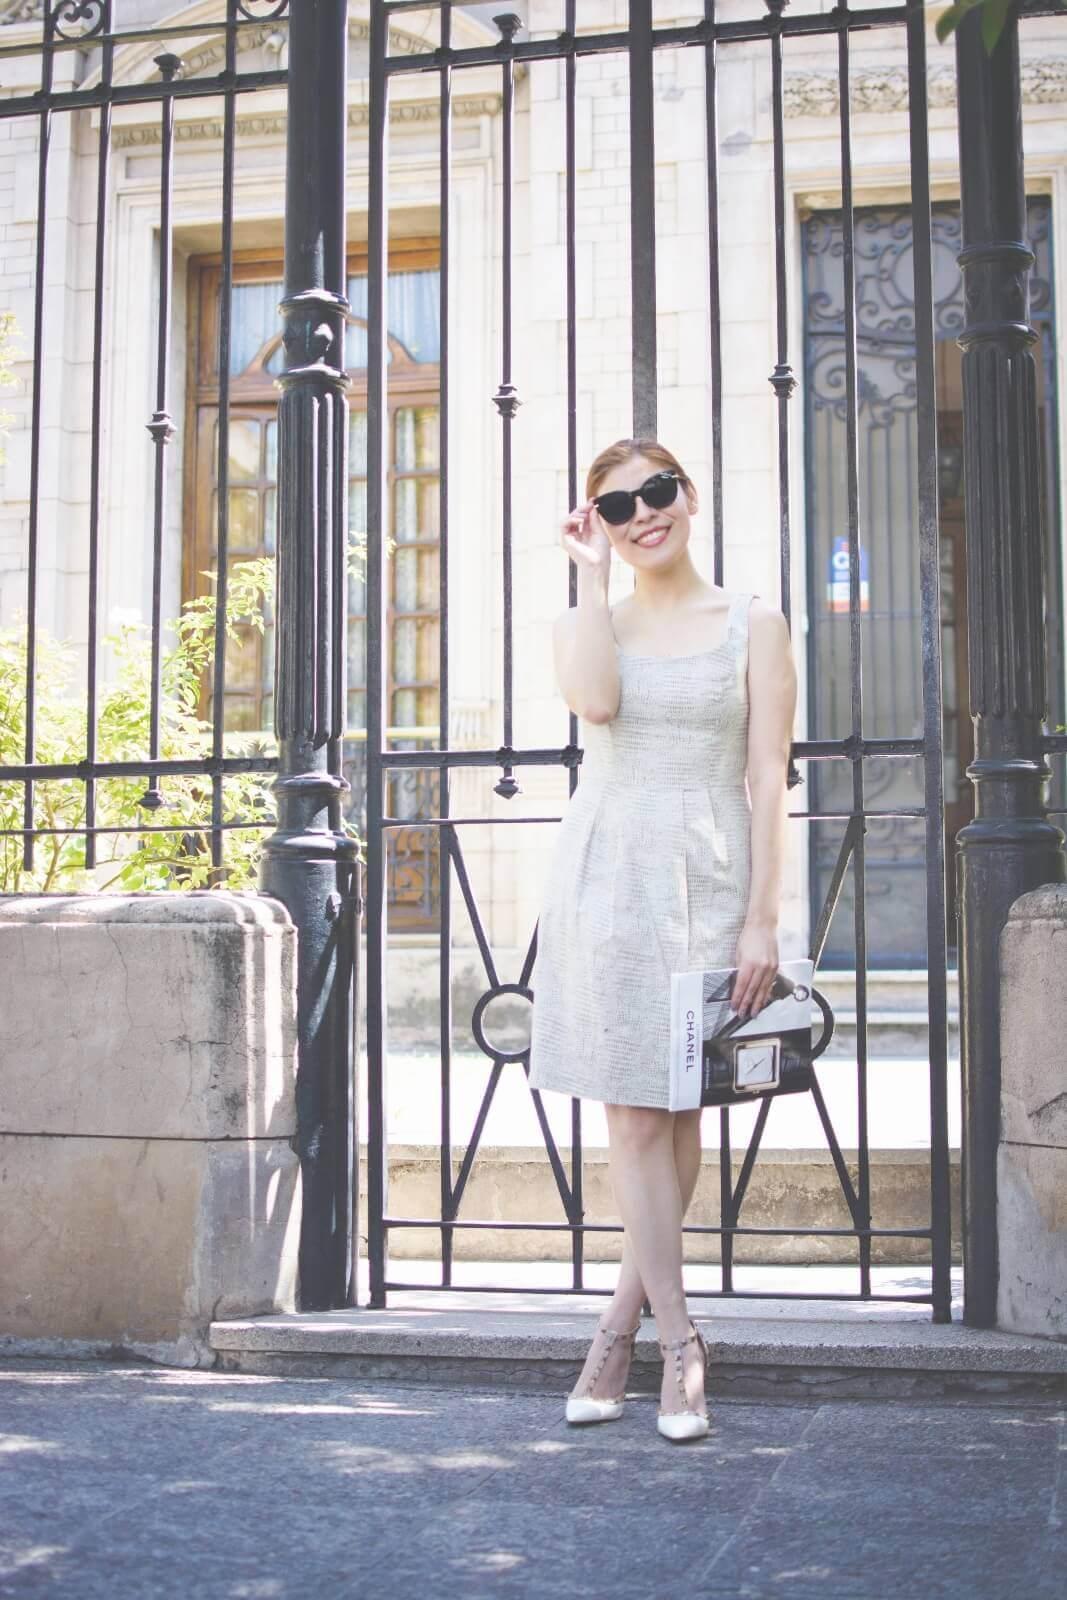 almond-white-dress-sammydress-stilettos-valentino-rockstud-imitation-deborah-ferrero-style-by-deb-ladylike01